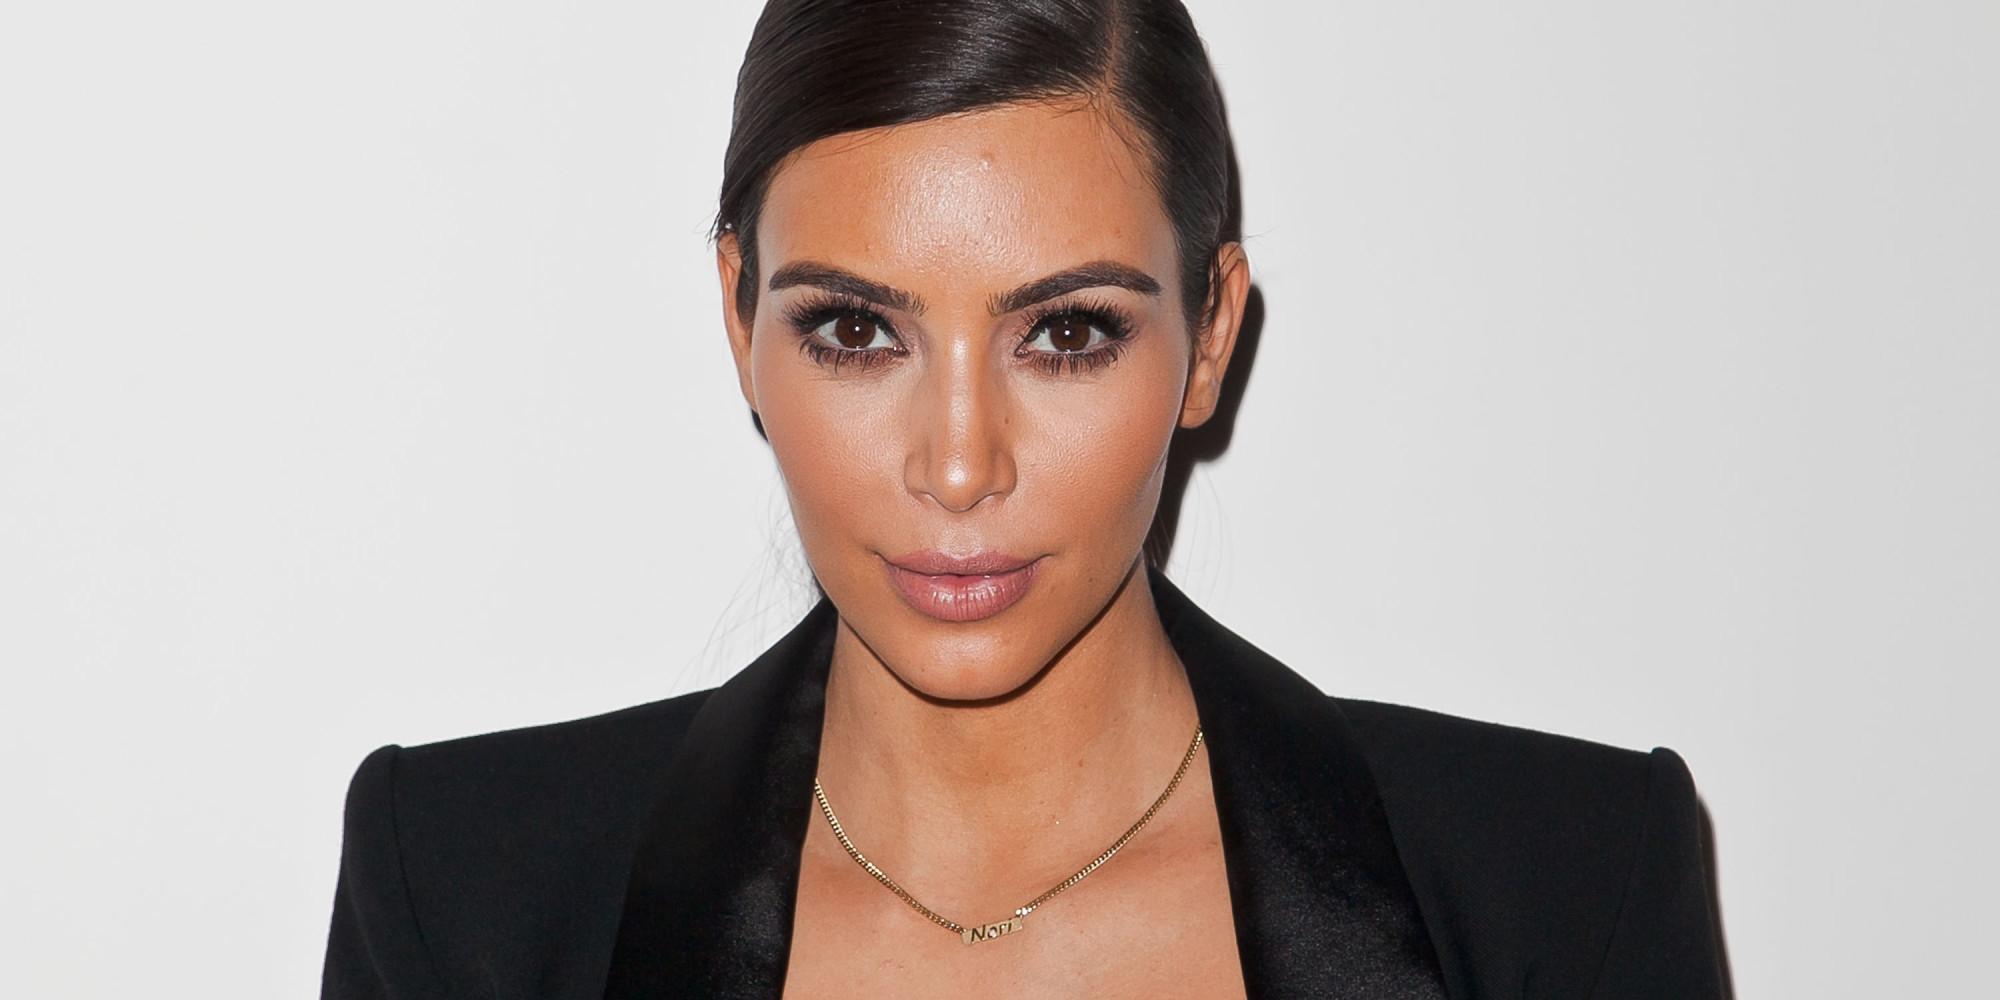 les anges rencontre avec kim kardashian